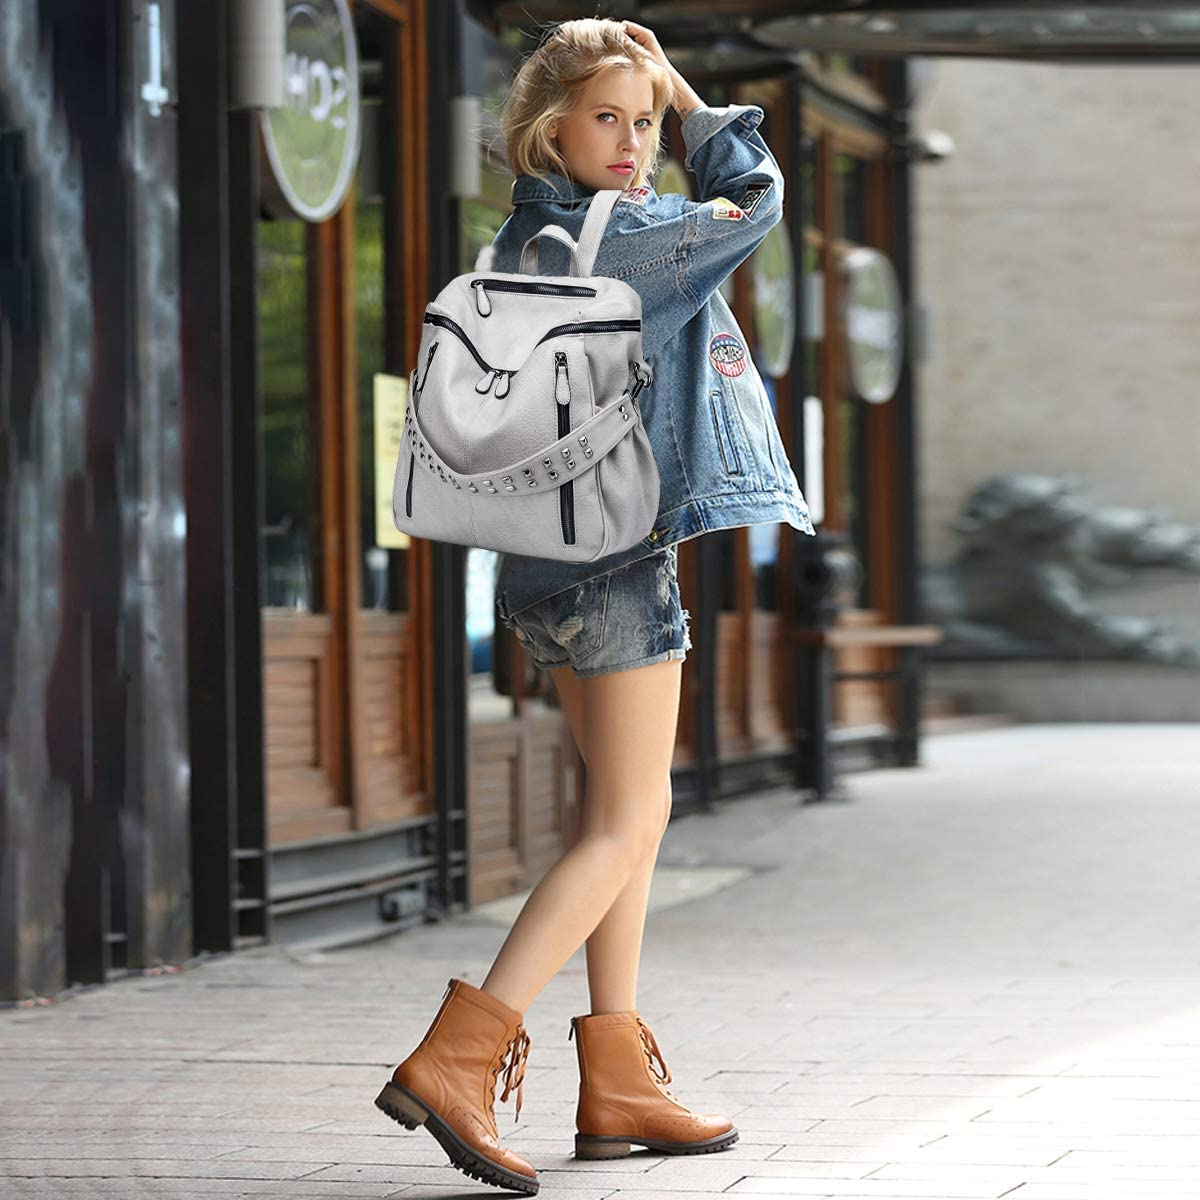 Tisdaini Sacs port/és dos Femme Mode Loisir Voyage Etudiante Sac a dos Sacs bandouli/ère business sacs a dos FR917